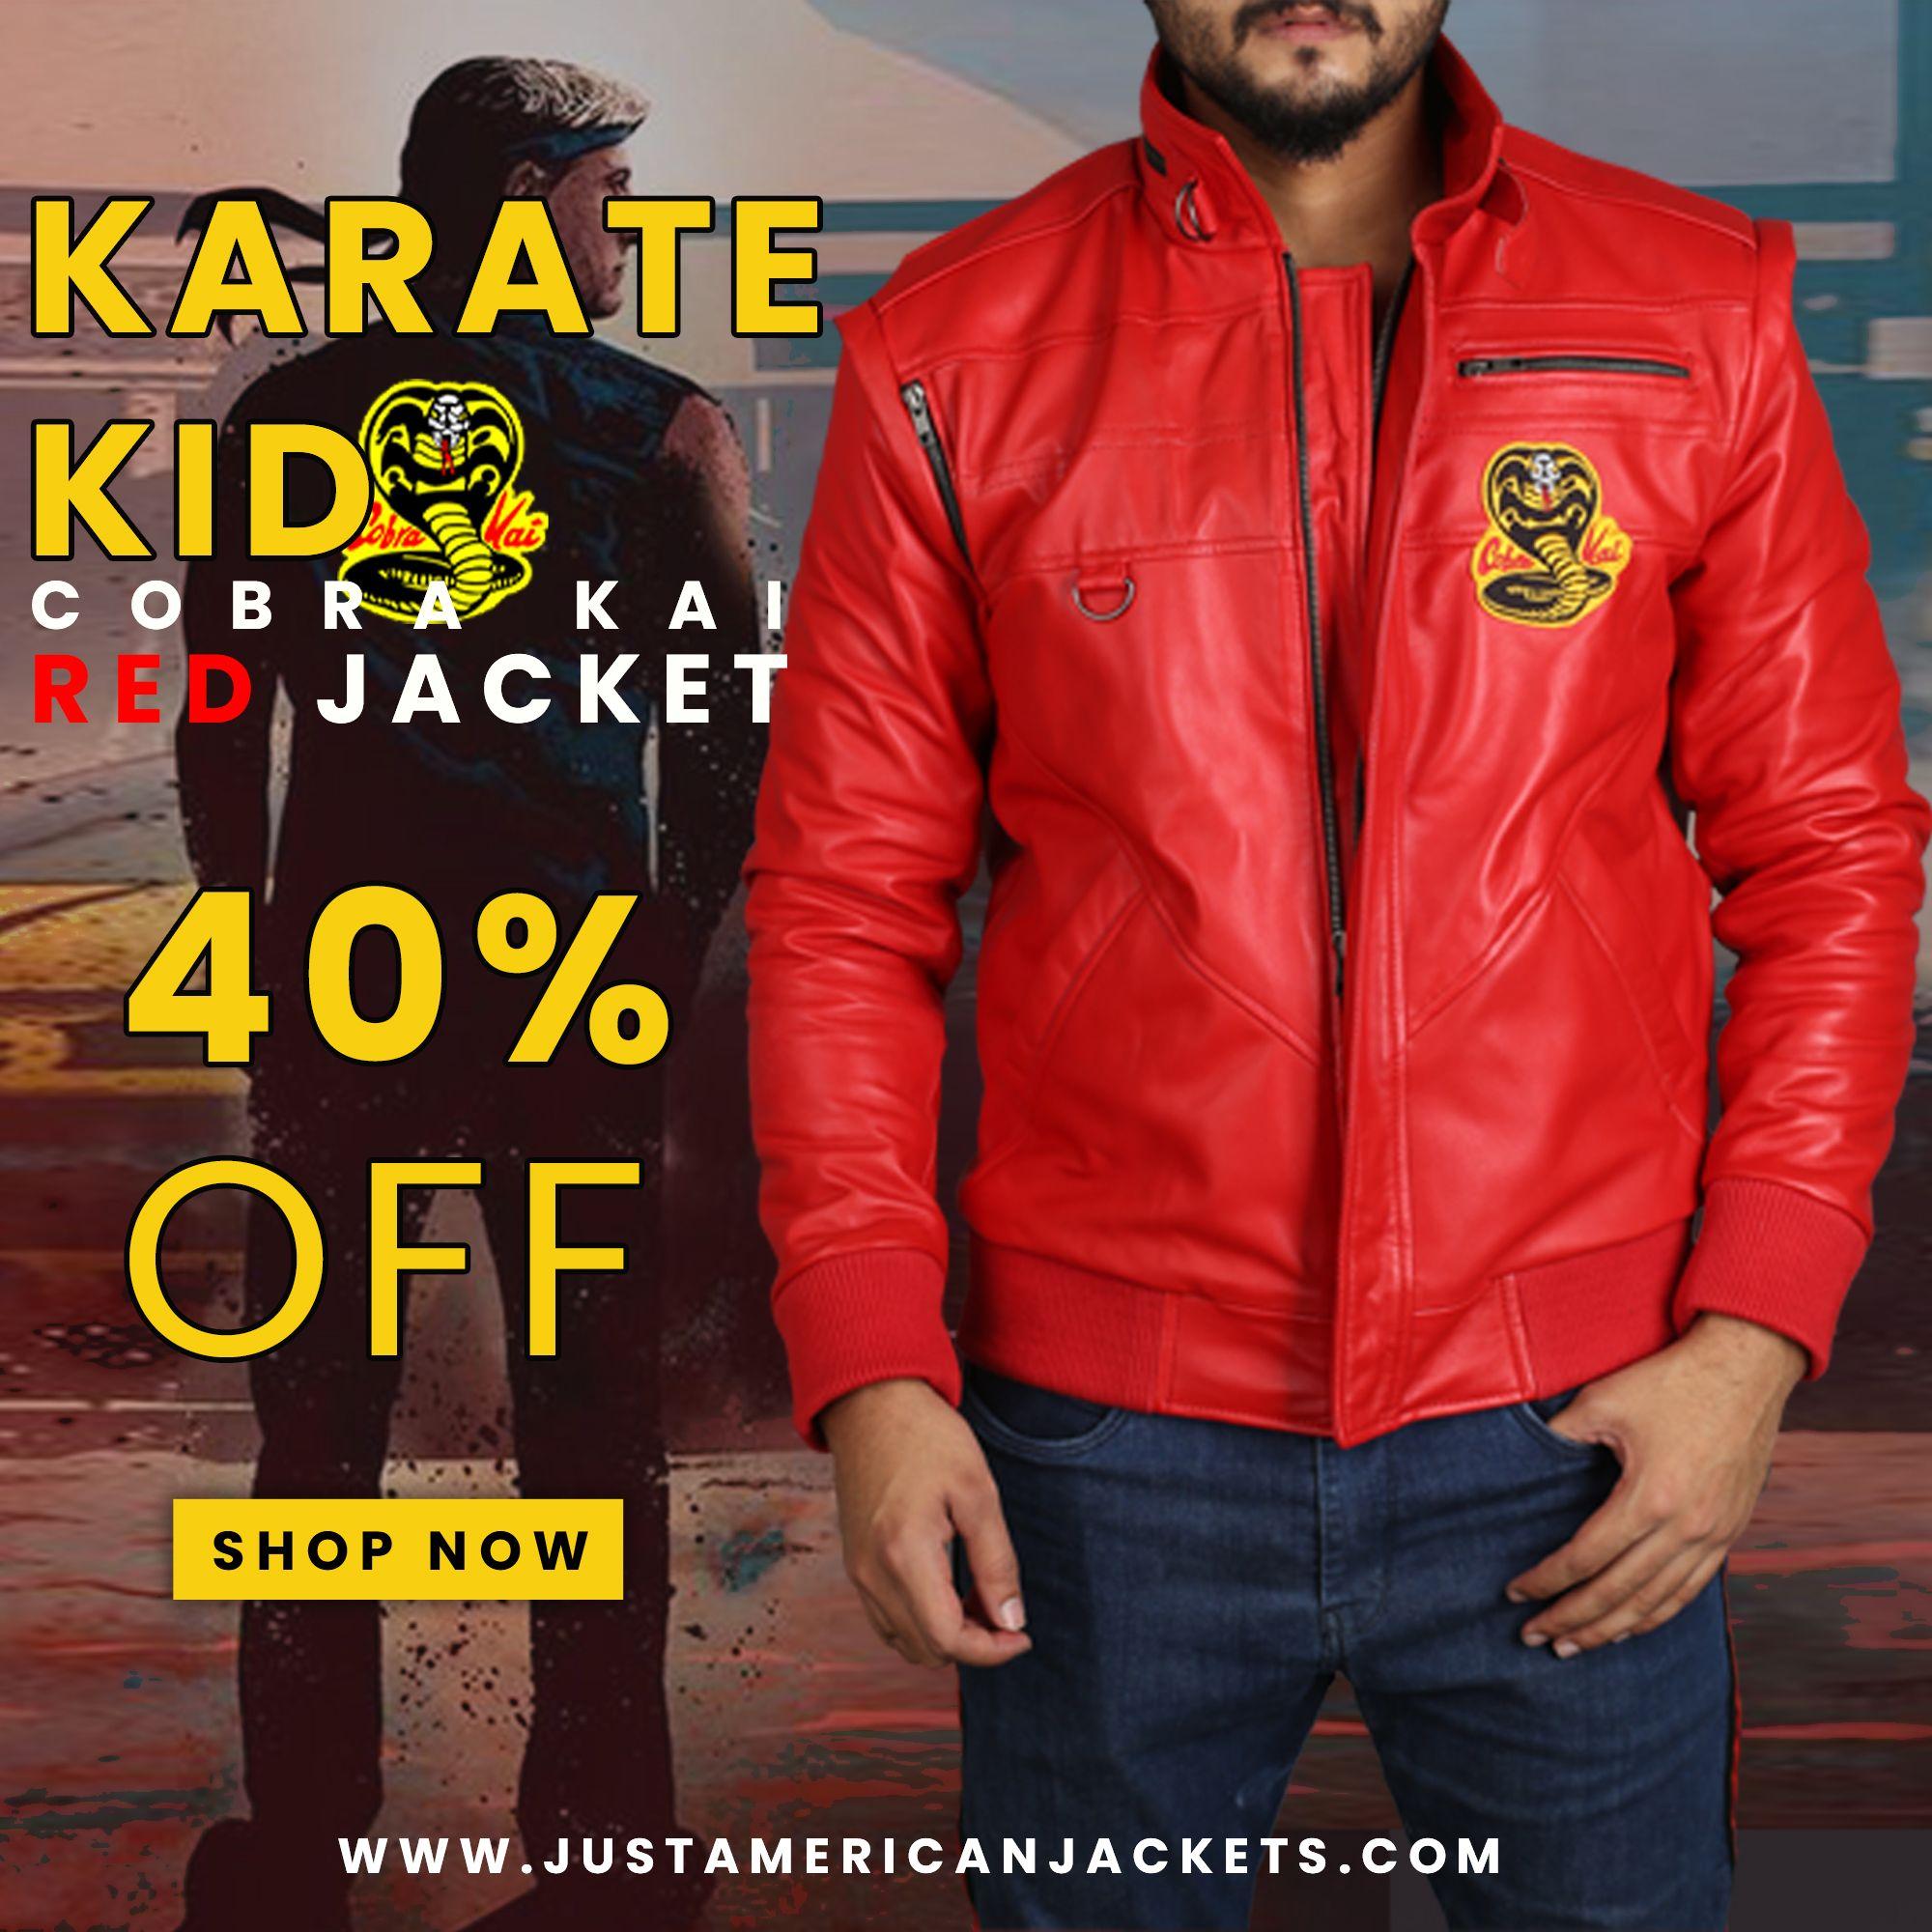 Cobra Kai Jacket Cobra Kai Red Bomber Jacket Just American Jackets Red Bomber Jacket Karate Kid Cobra Kai Red Jacket [ 2000 x 2000 Pixel ]